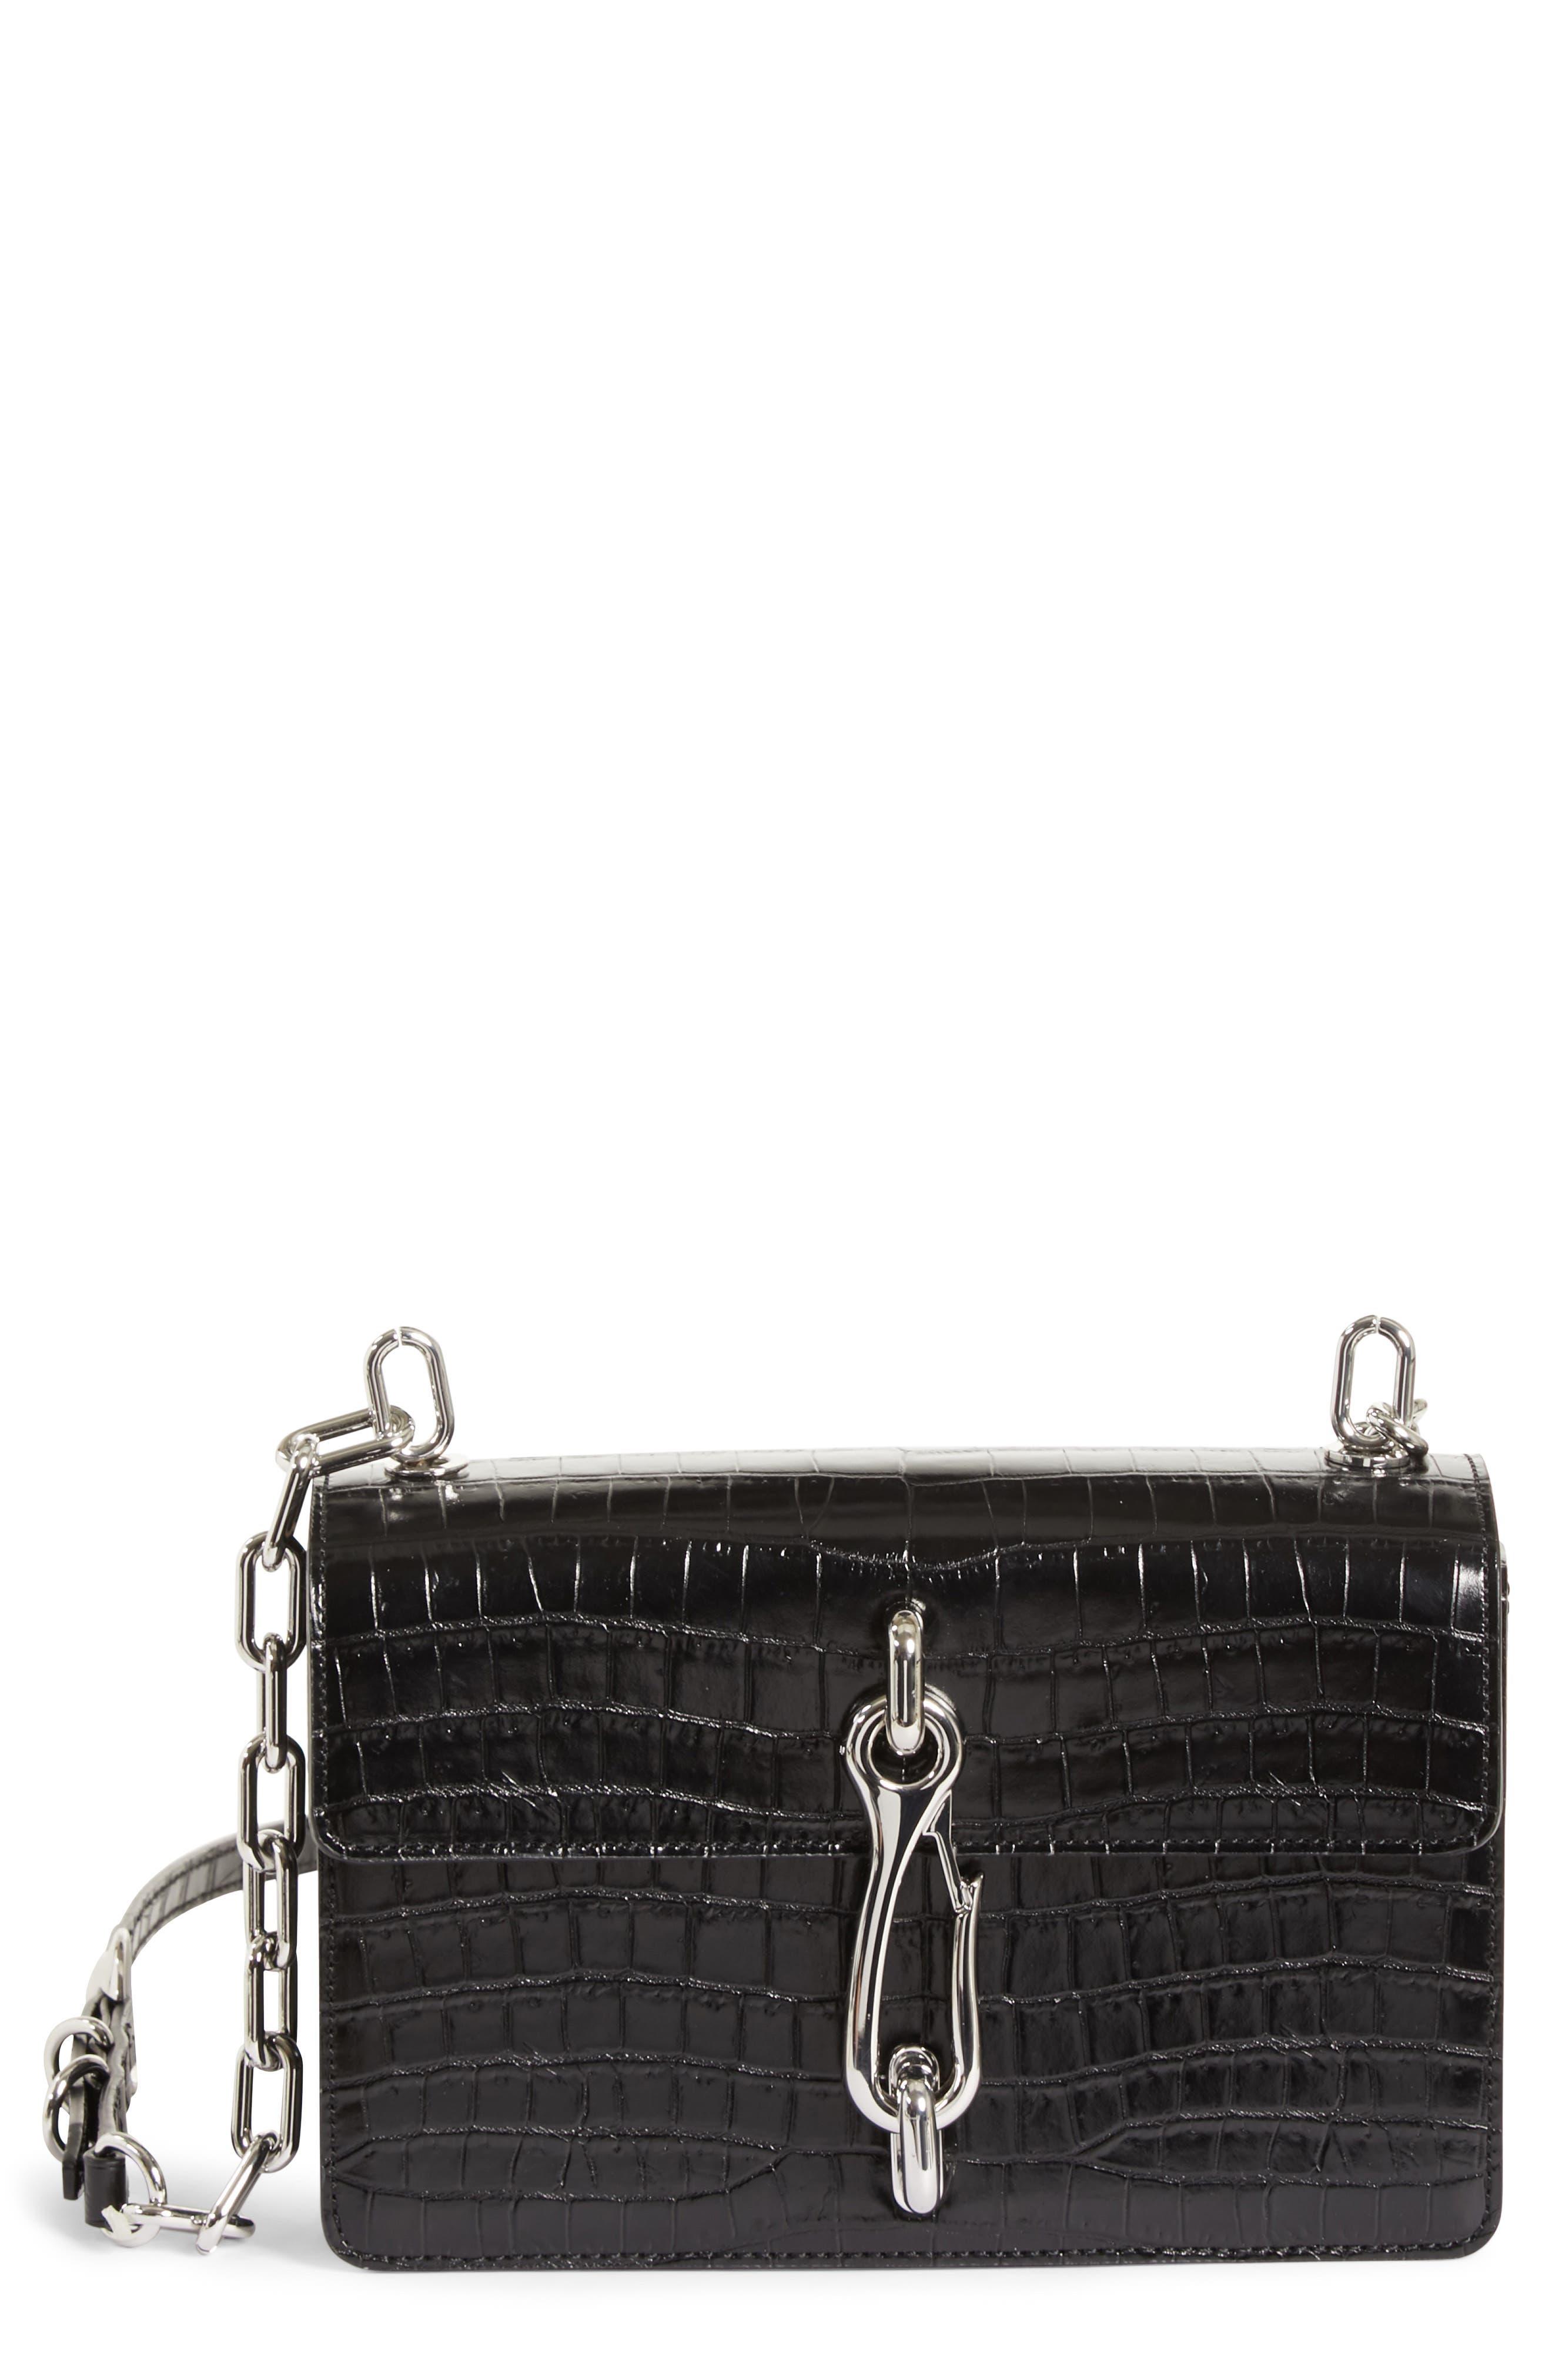 Hook Medium Leather Shoulder/Crossbody Bag, Main, color, 001